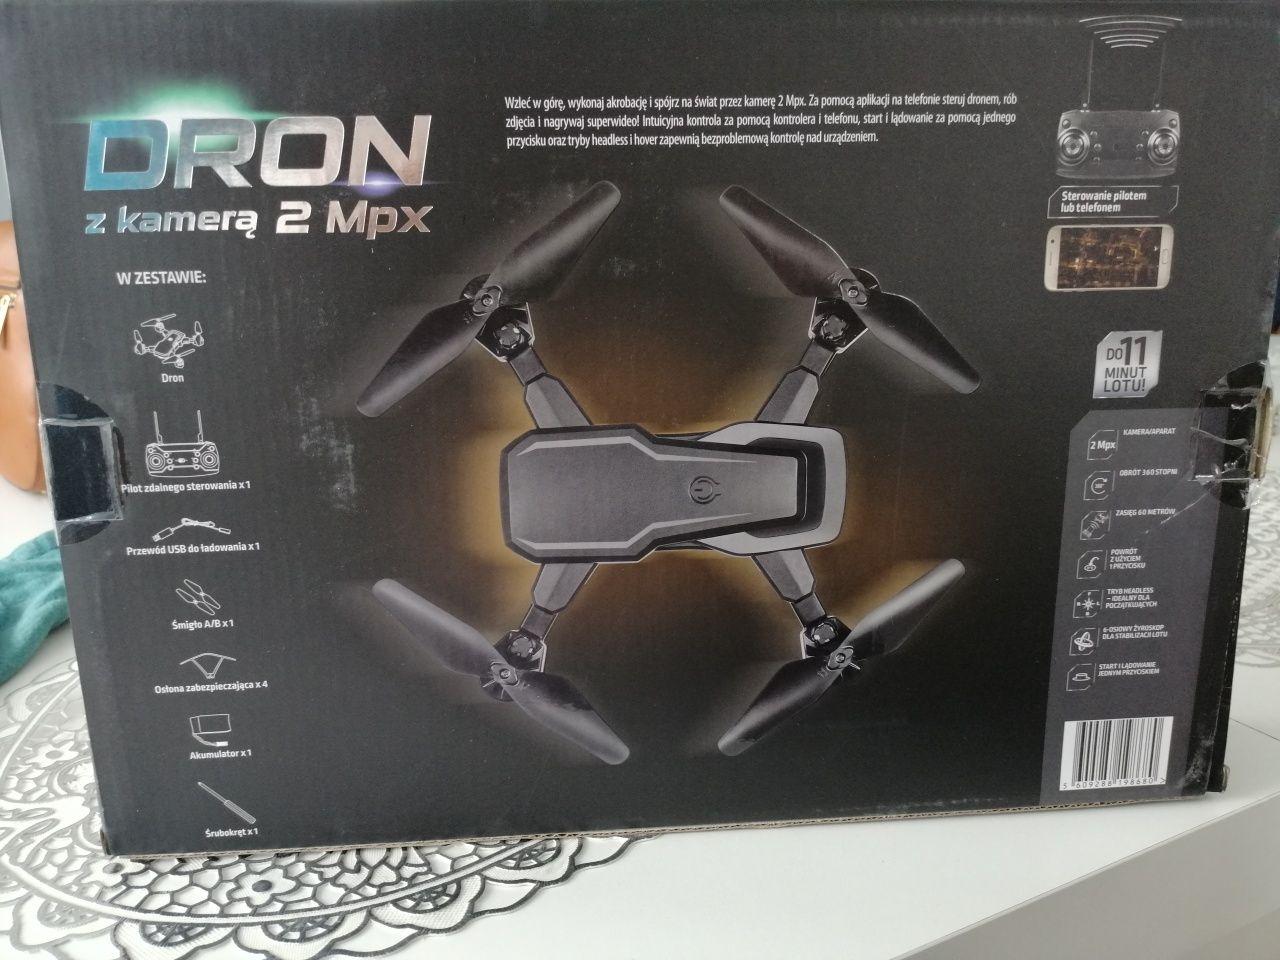 Dron z kamerką 2 MPX